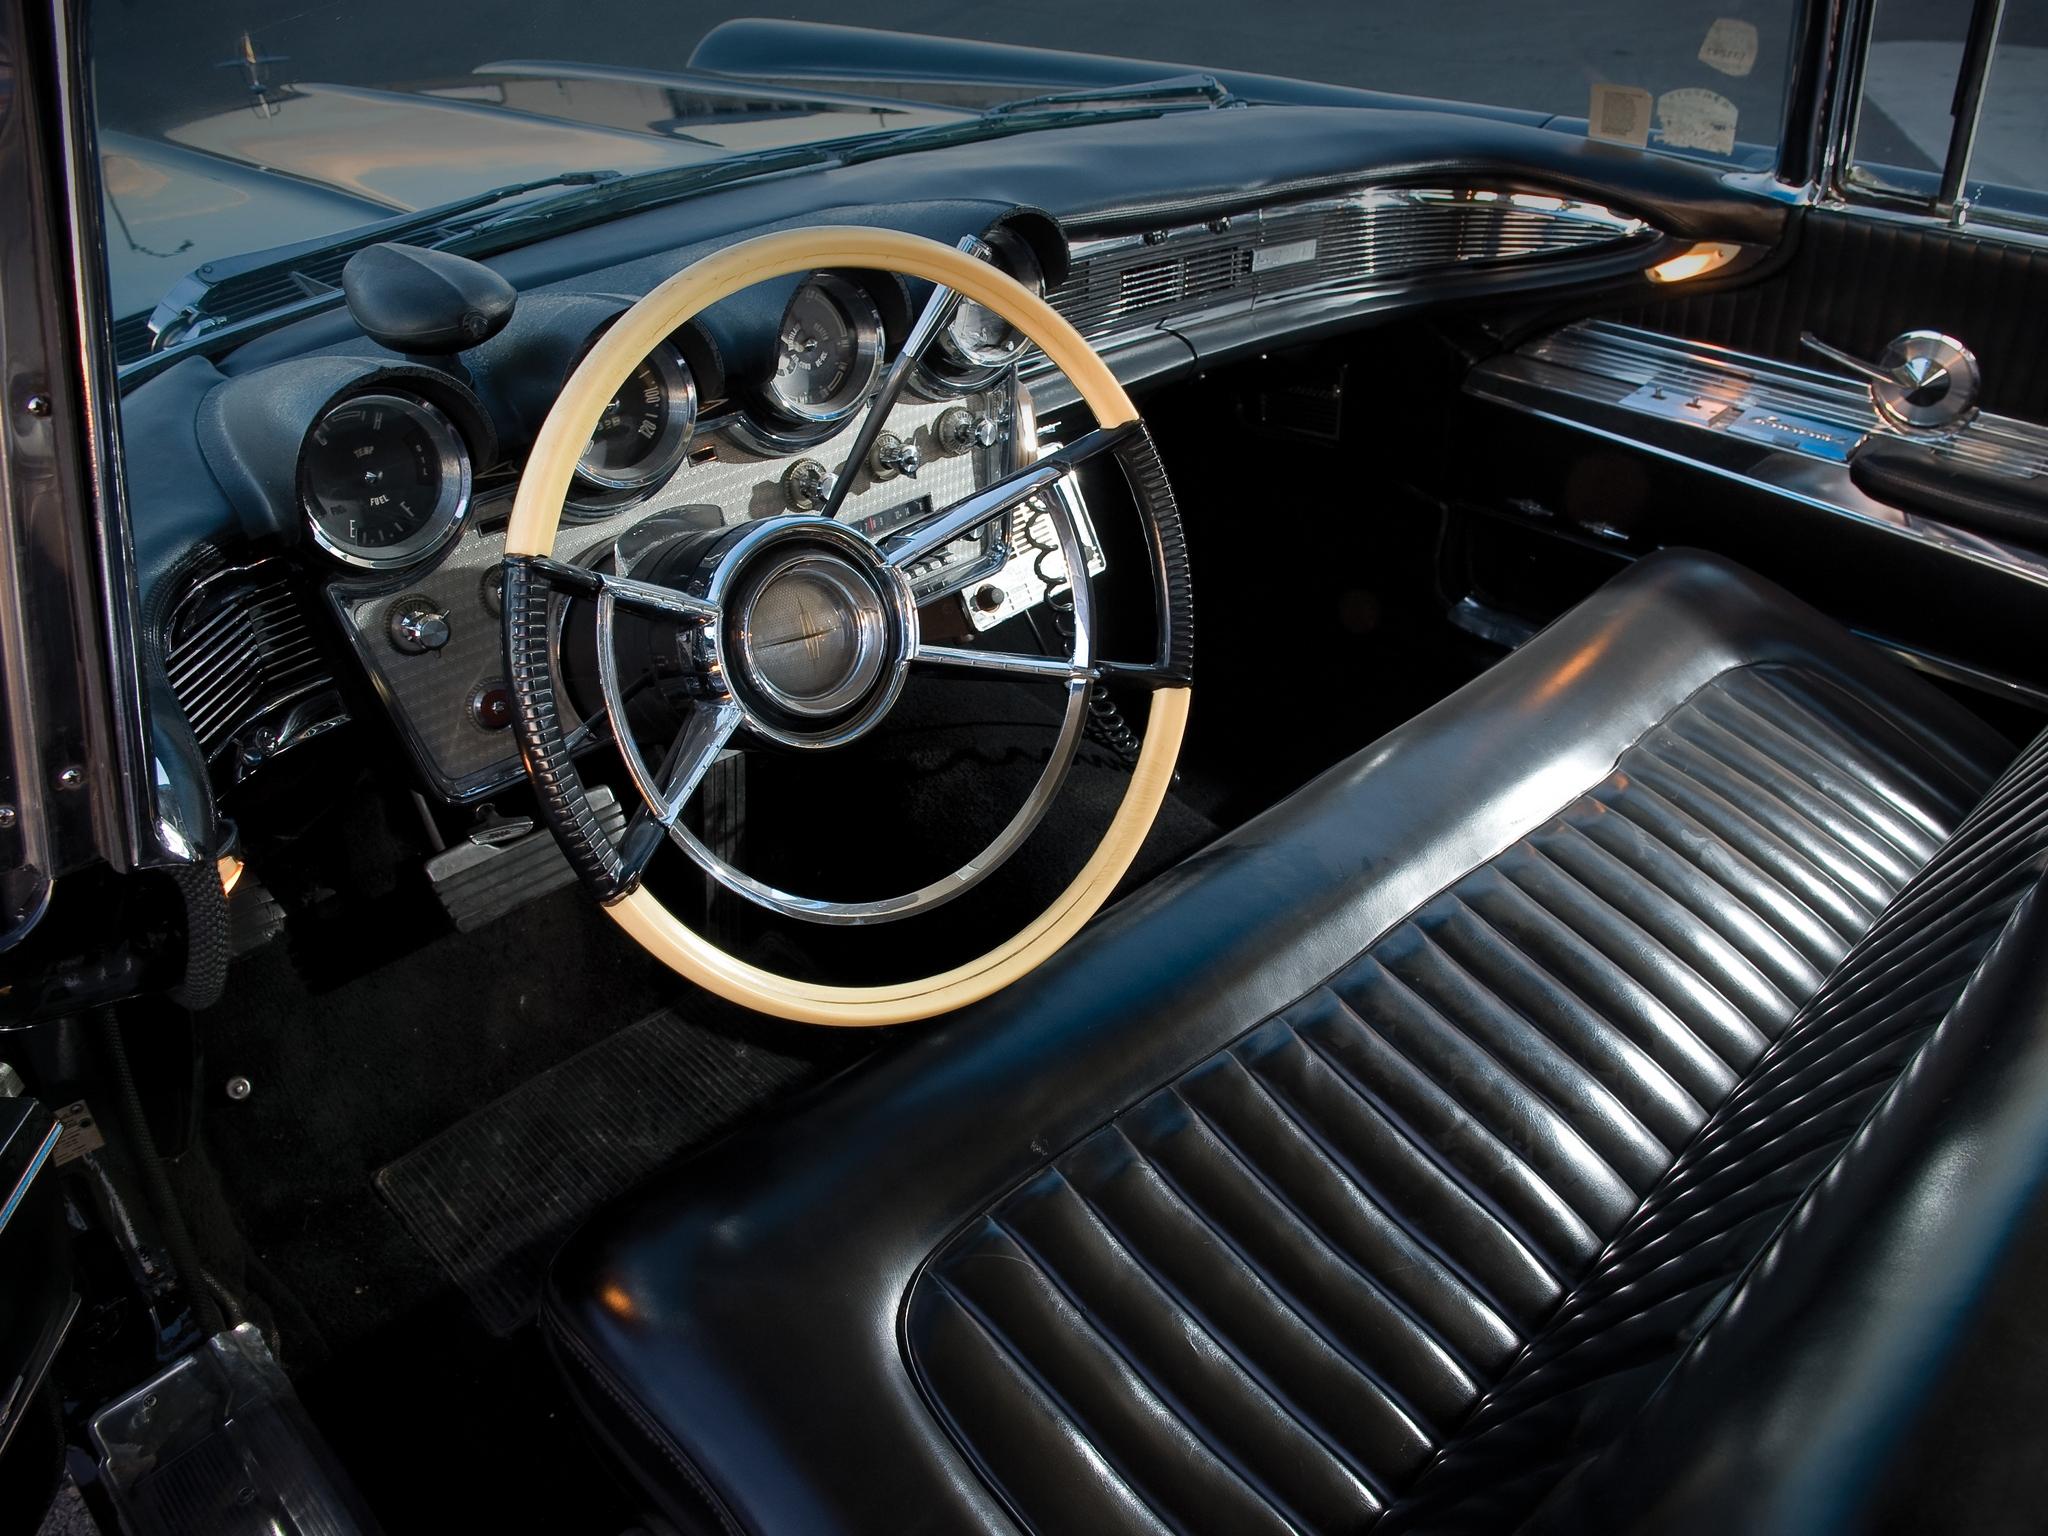 1960 lincoln continental mark v limousine classic luxury interior g wallpaper 2048x1536. Black Bedroom Furniture Sets. Home Design Ideas